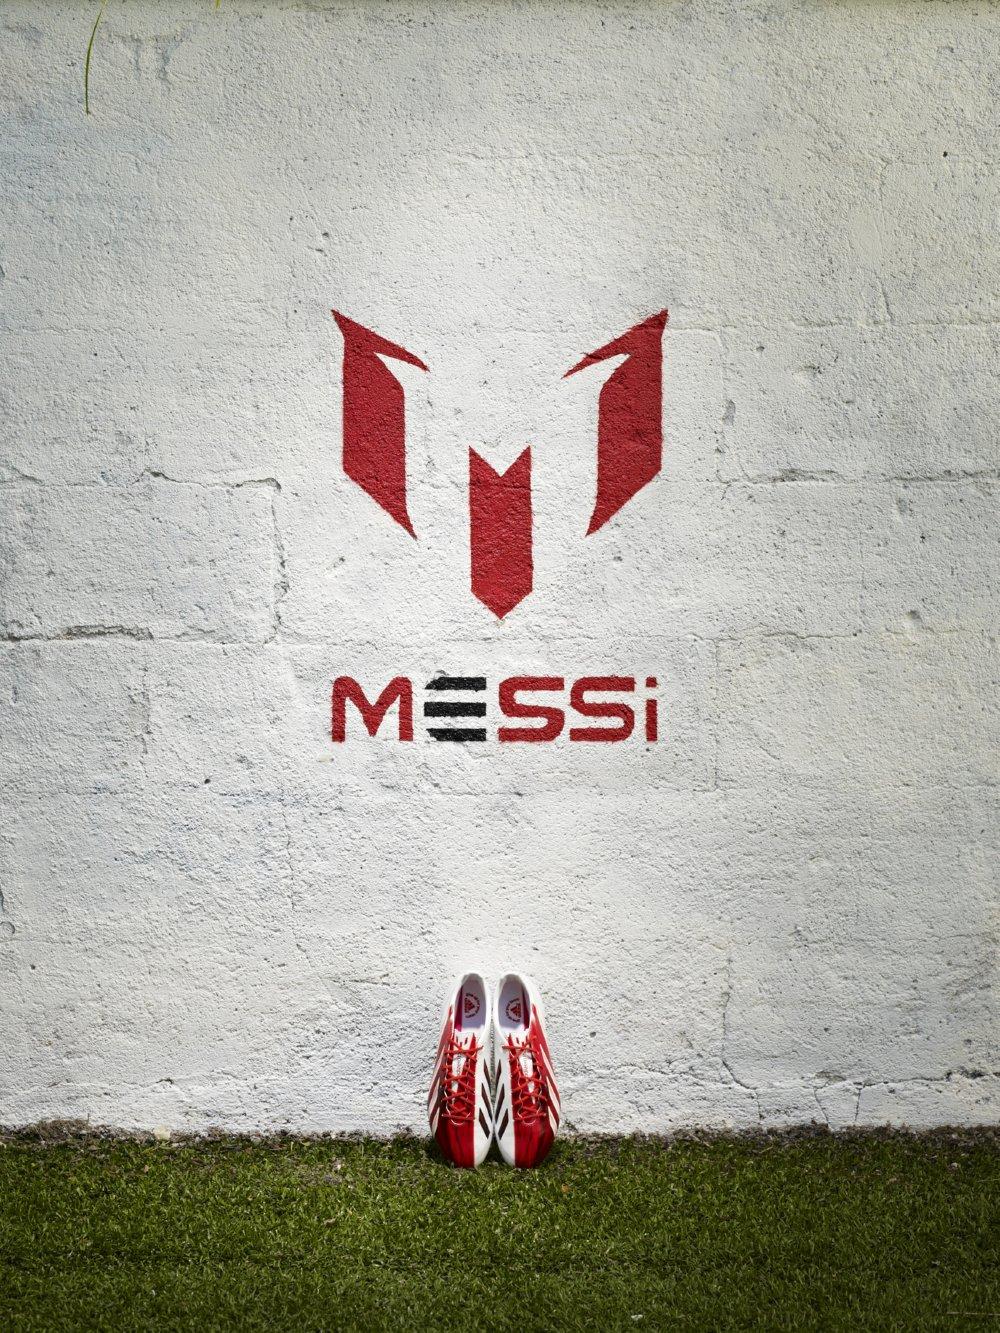 066c1cba3 These Are Lionel Messi's New AdiZero F50 Boots, As Designed By Lionel Messi  (Photos)